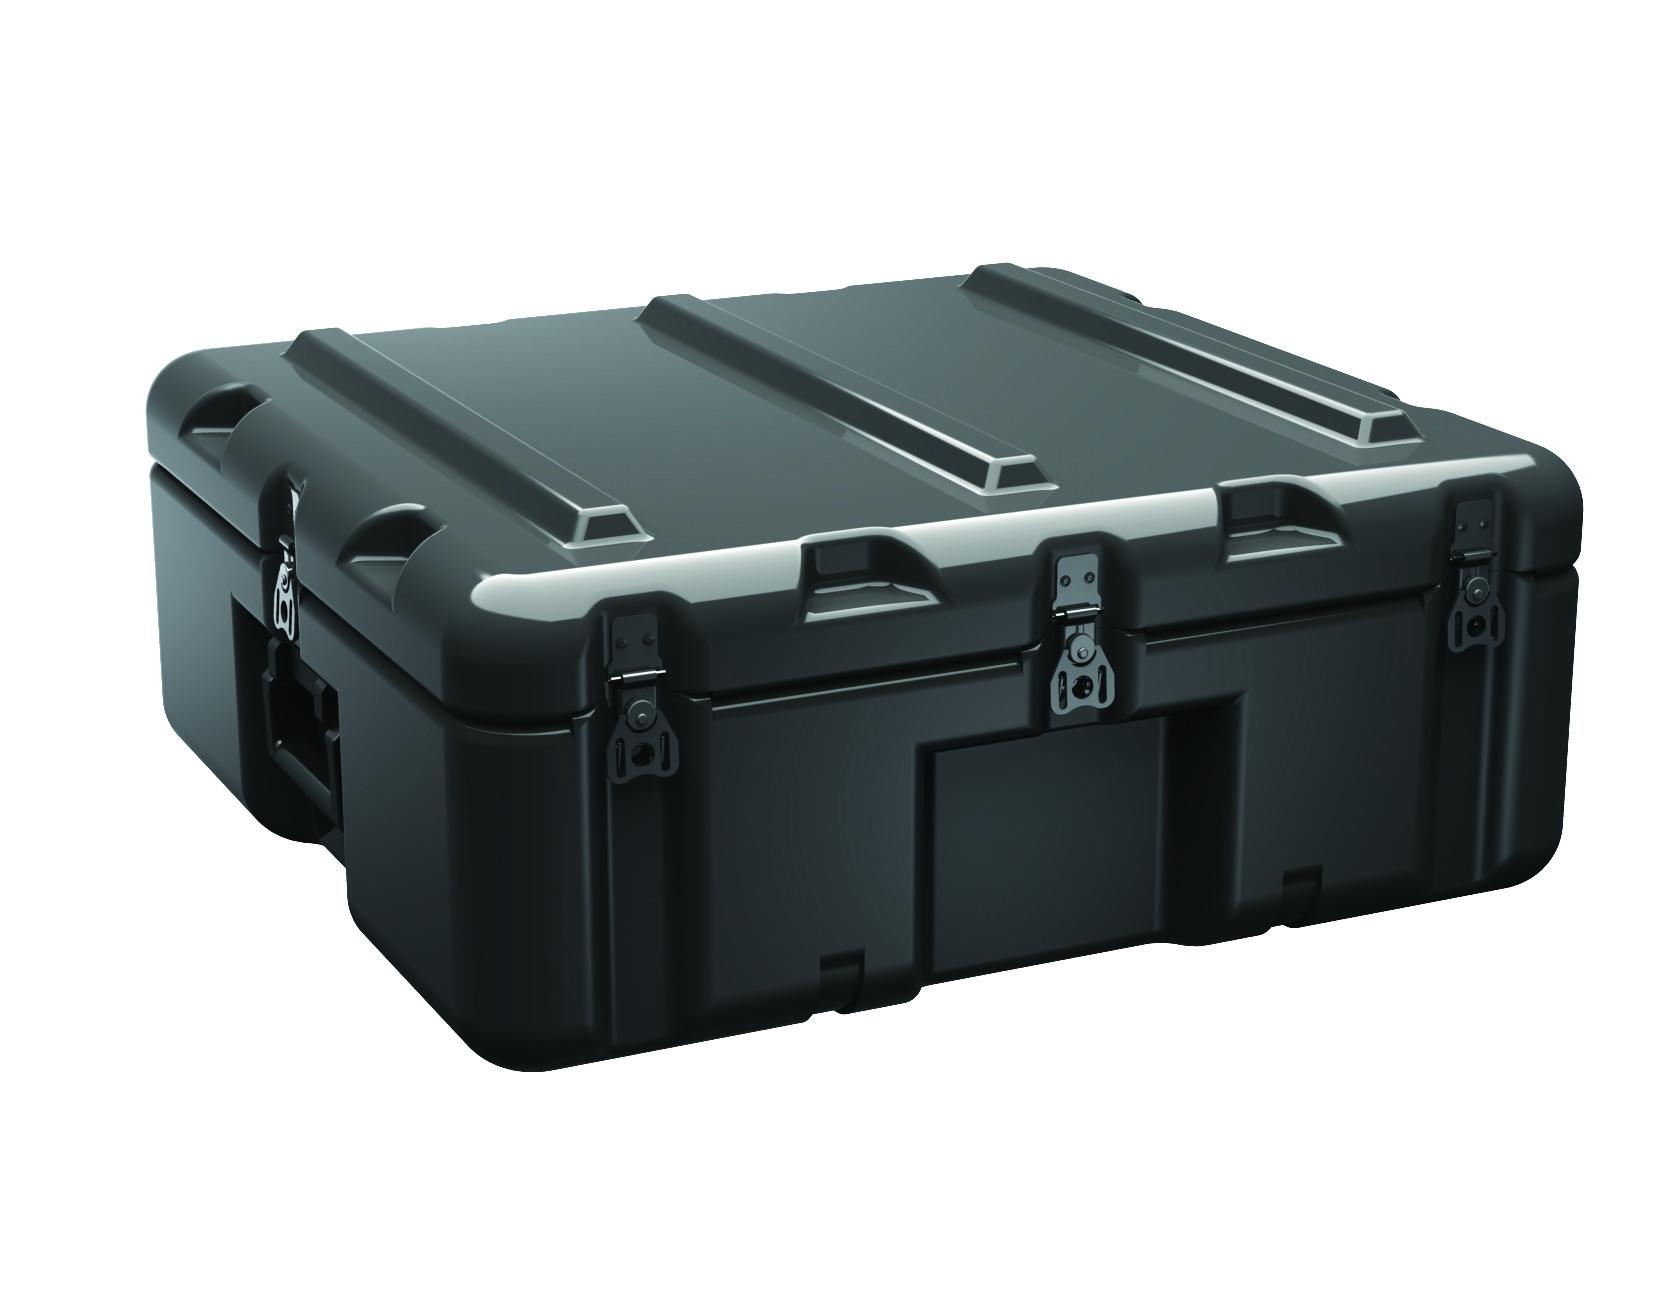 AL2221-0602 - Pelican AL2221-0602 Flat Case Shipping Case